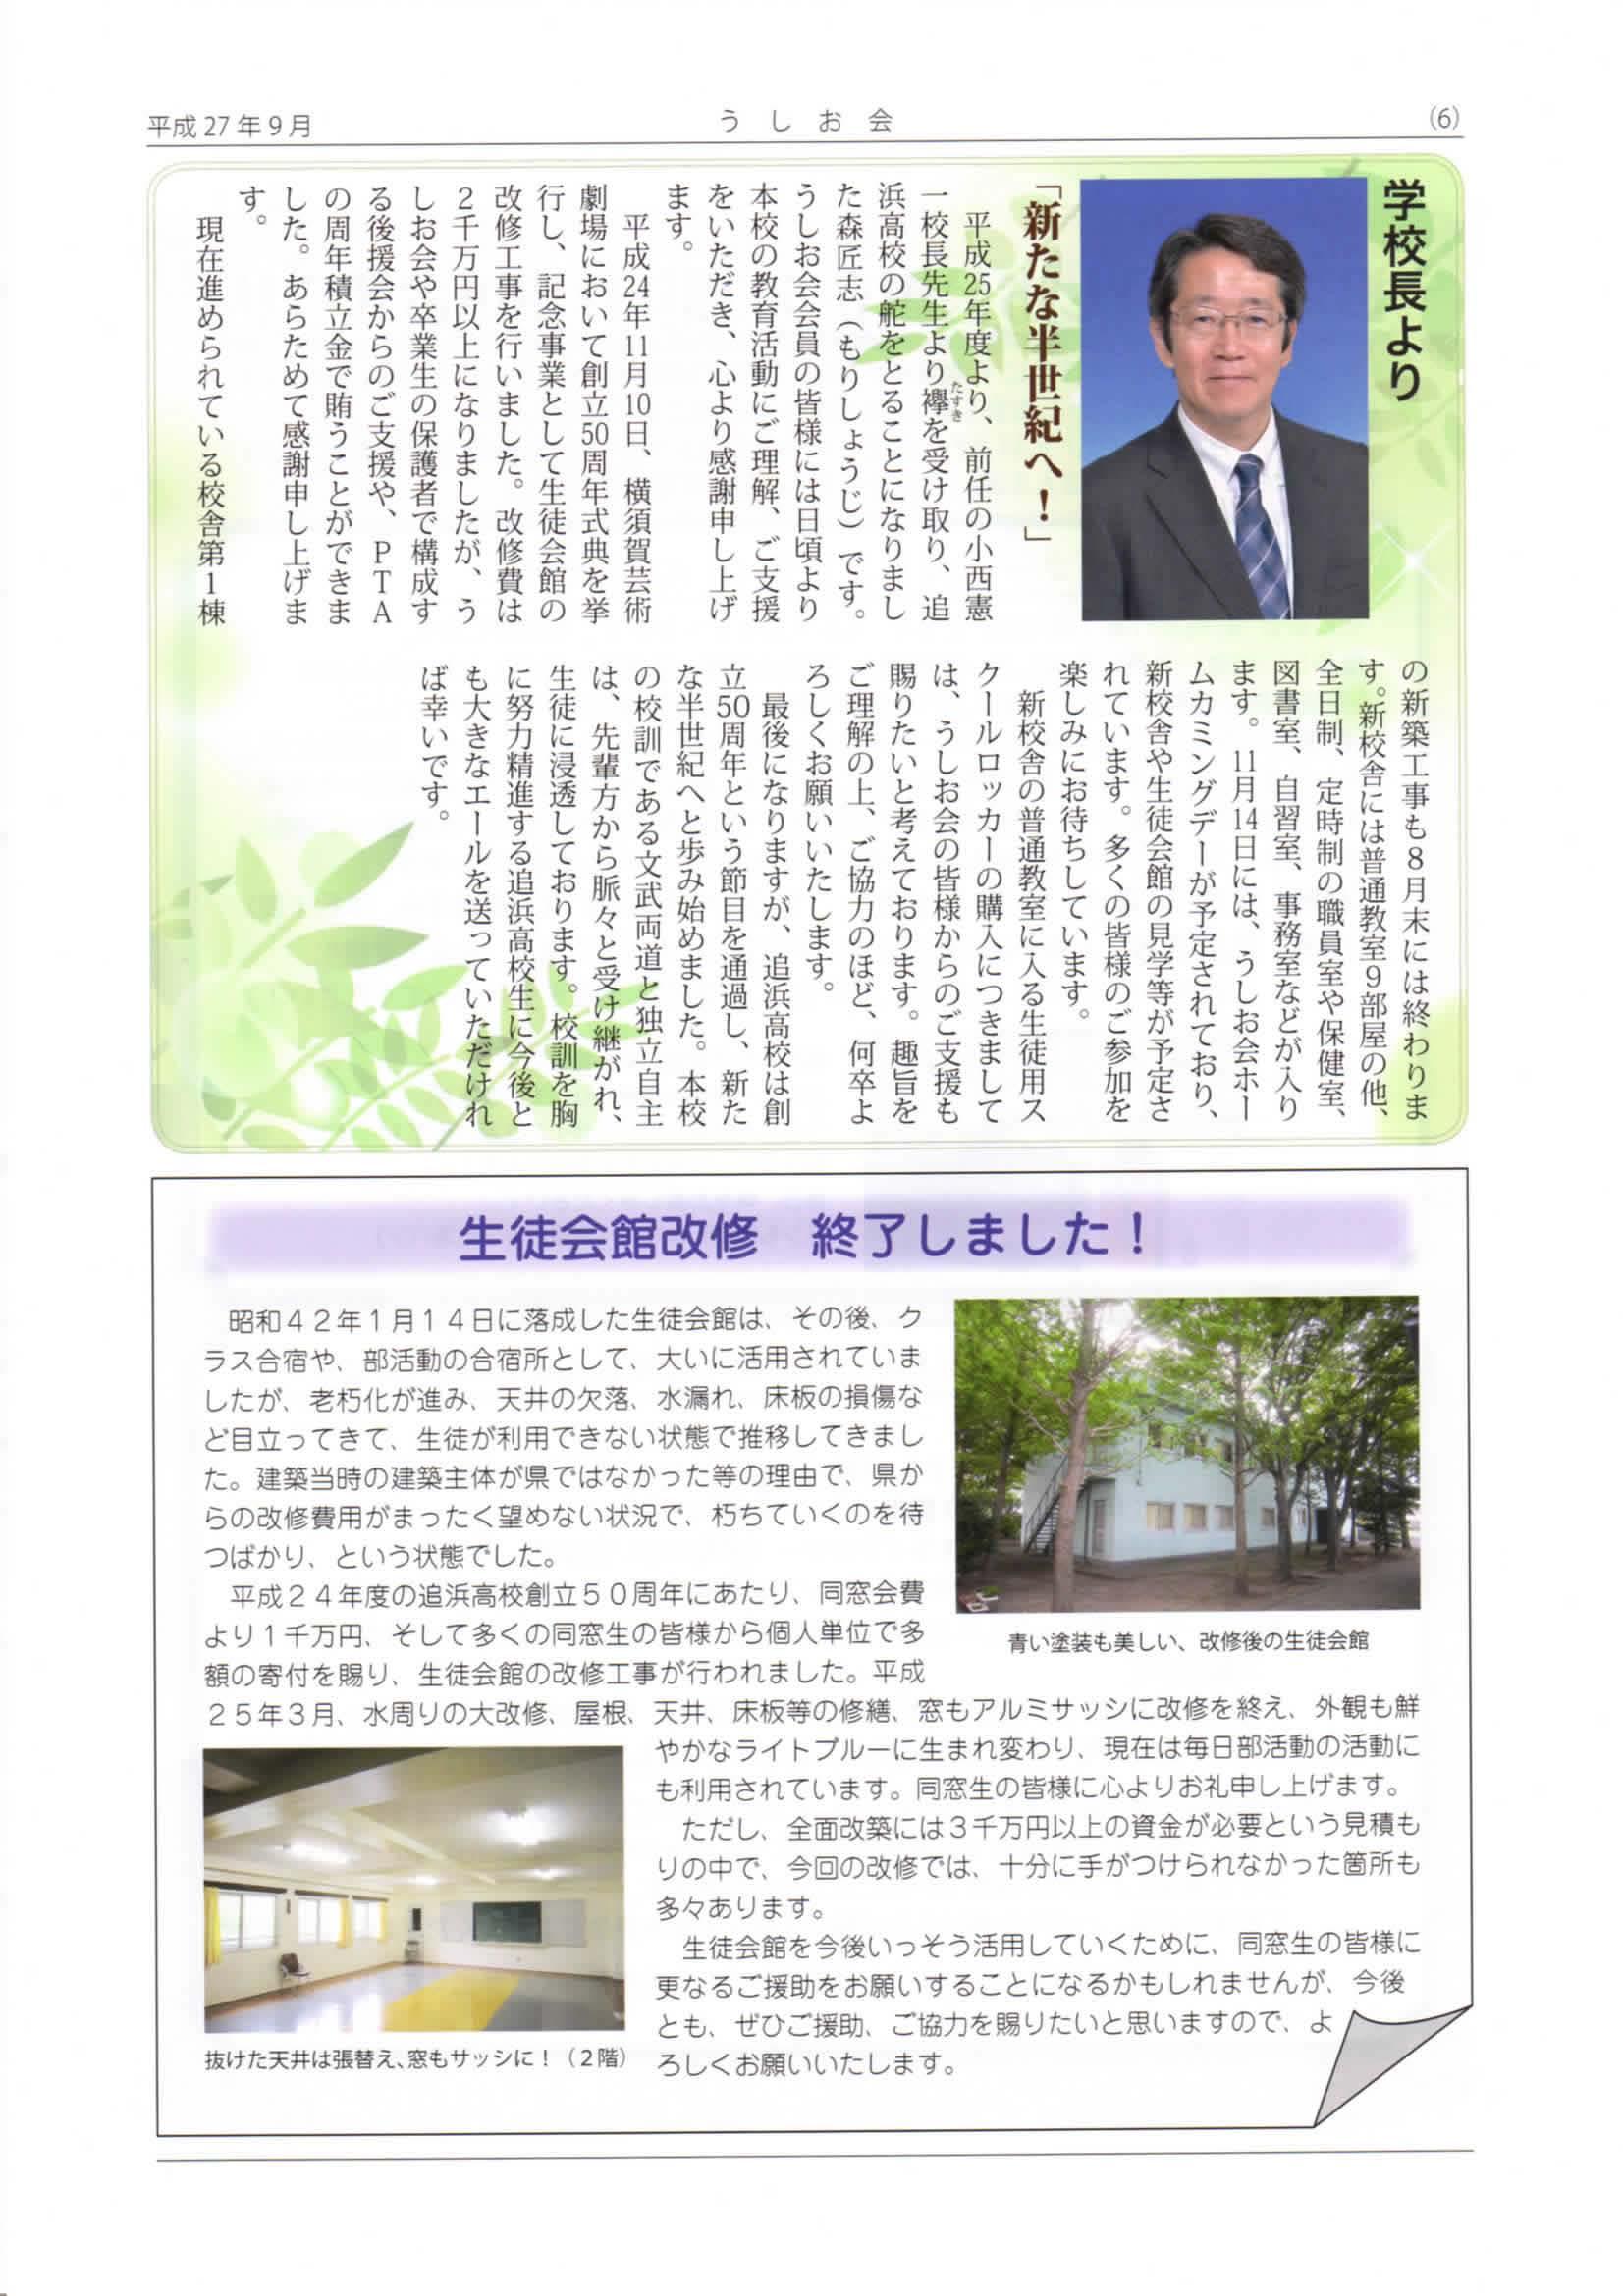 http://www.xn--p8ji2b326tgf0astg8i7difs.jp/ushio-info/images/ushio_201509_6.jpg